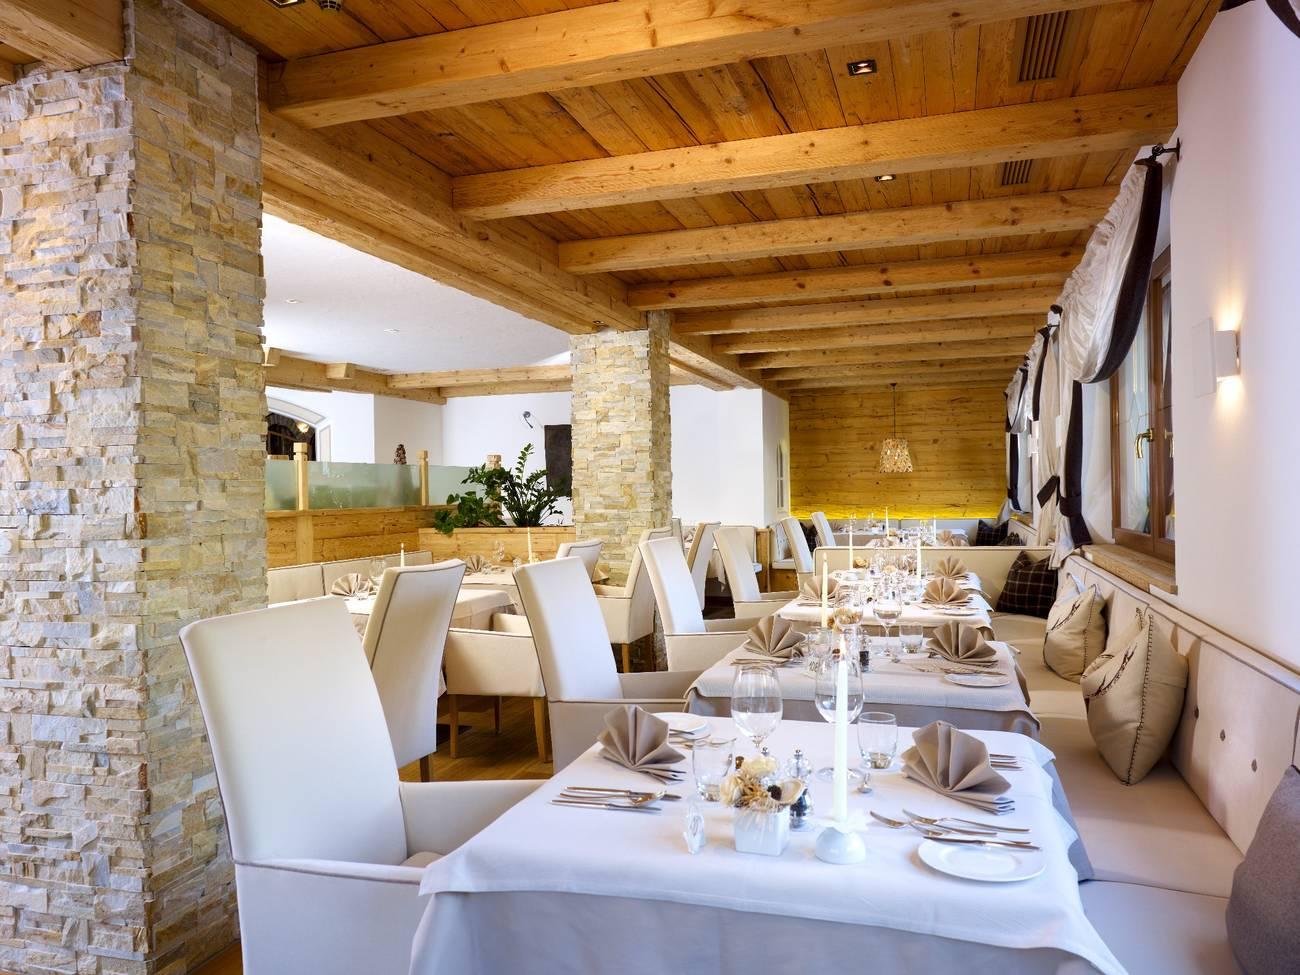 savoy dolomites luxury spa hotel in selva val gardena italy